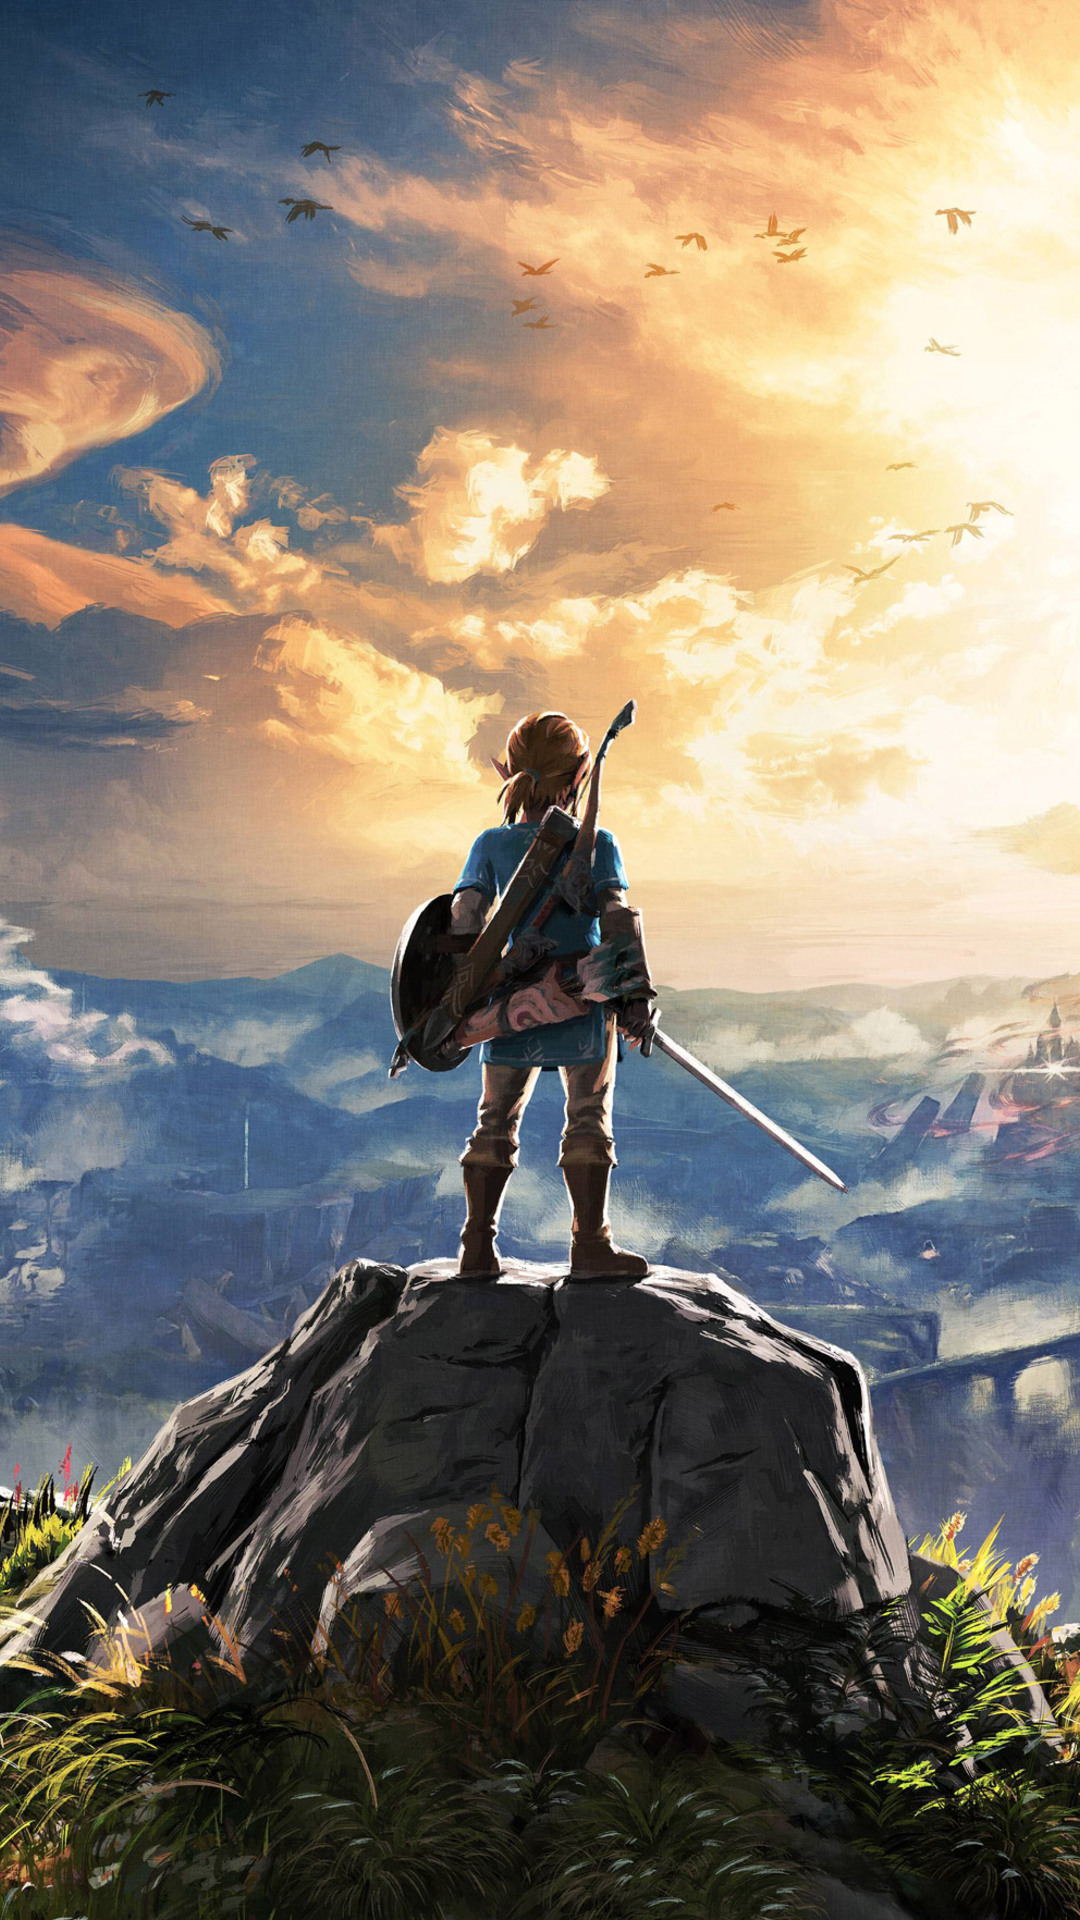 1080x1920 The Legend Of Zelda Breath Of The Wild 4k Iphone 7,6s,6 Plus, Pixel xl ,One Plus 3,3t